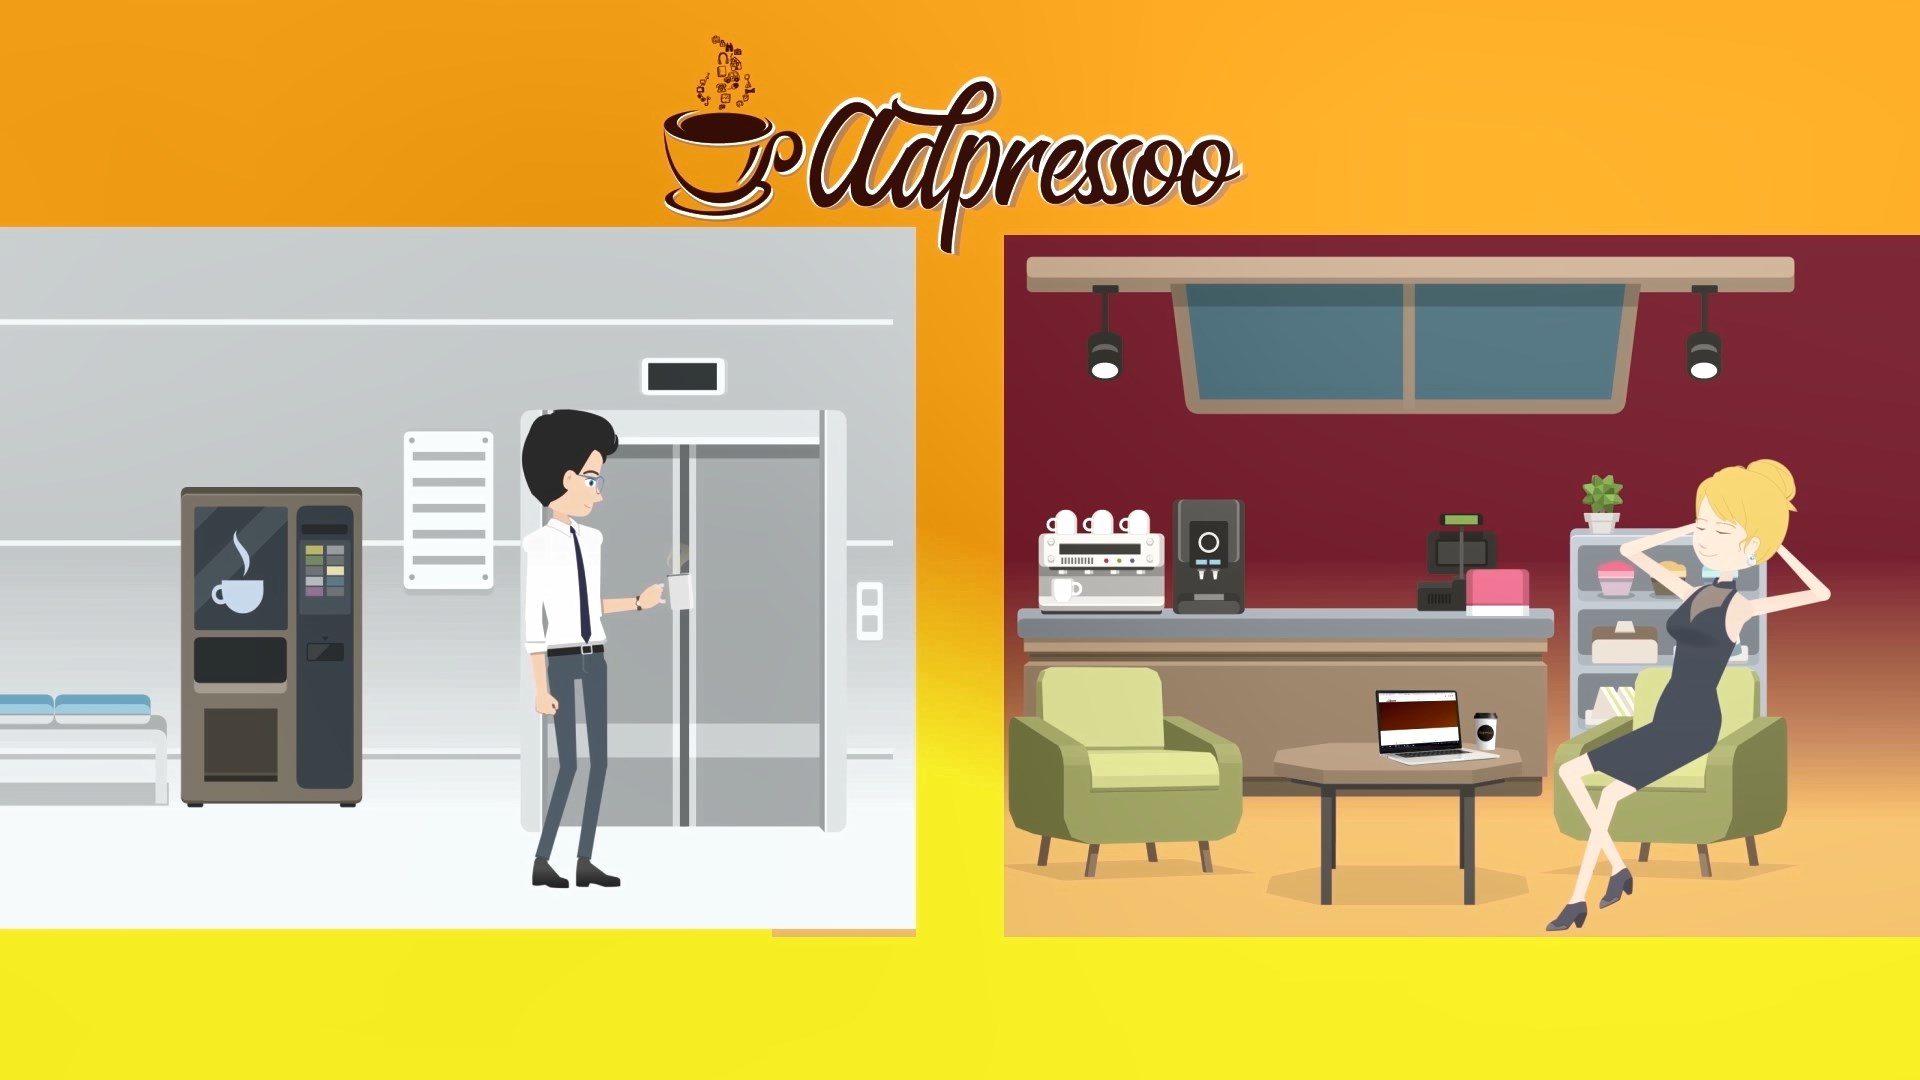 aspressoo.com 8 1920x1080 - ADPRESSOO TANITIM ANİMSYON FİLMİ